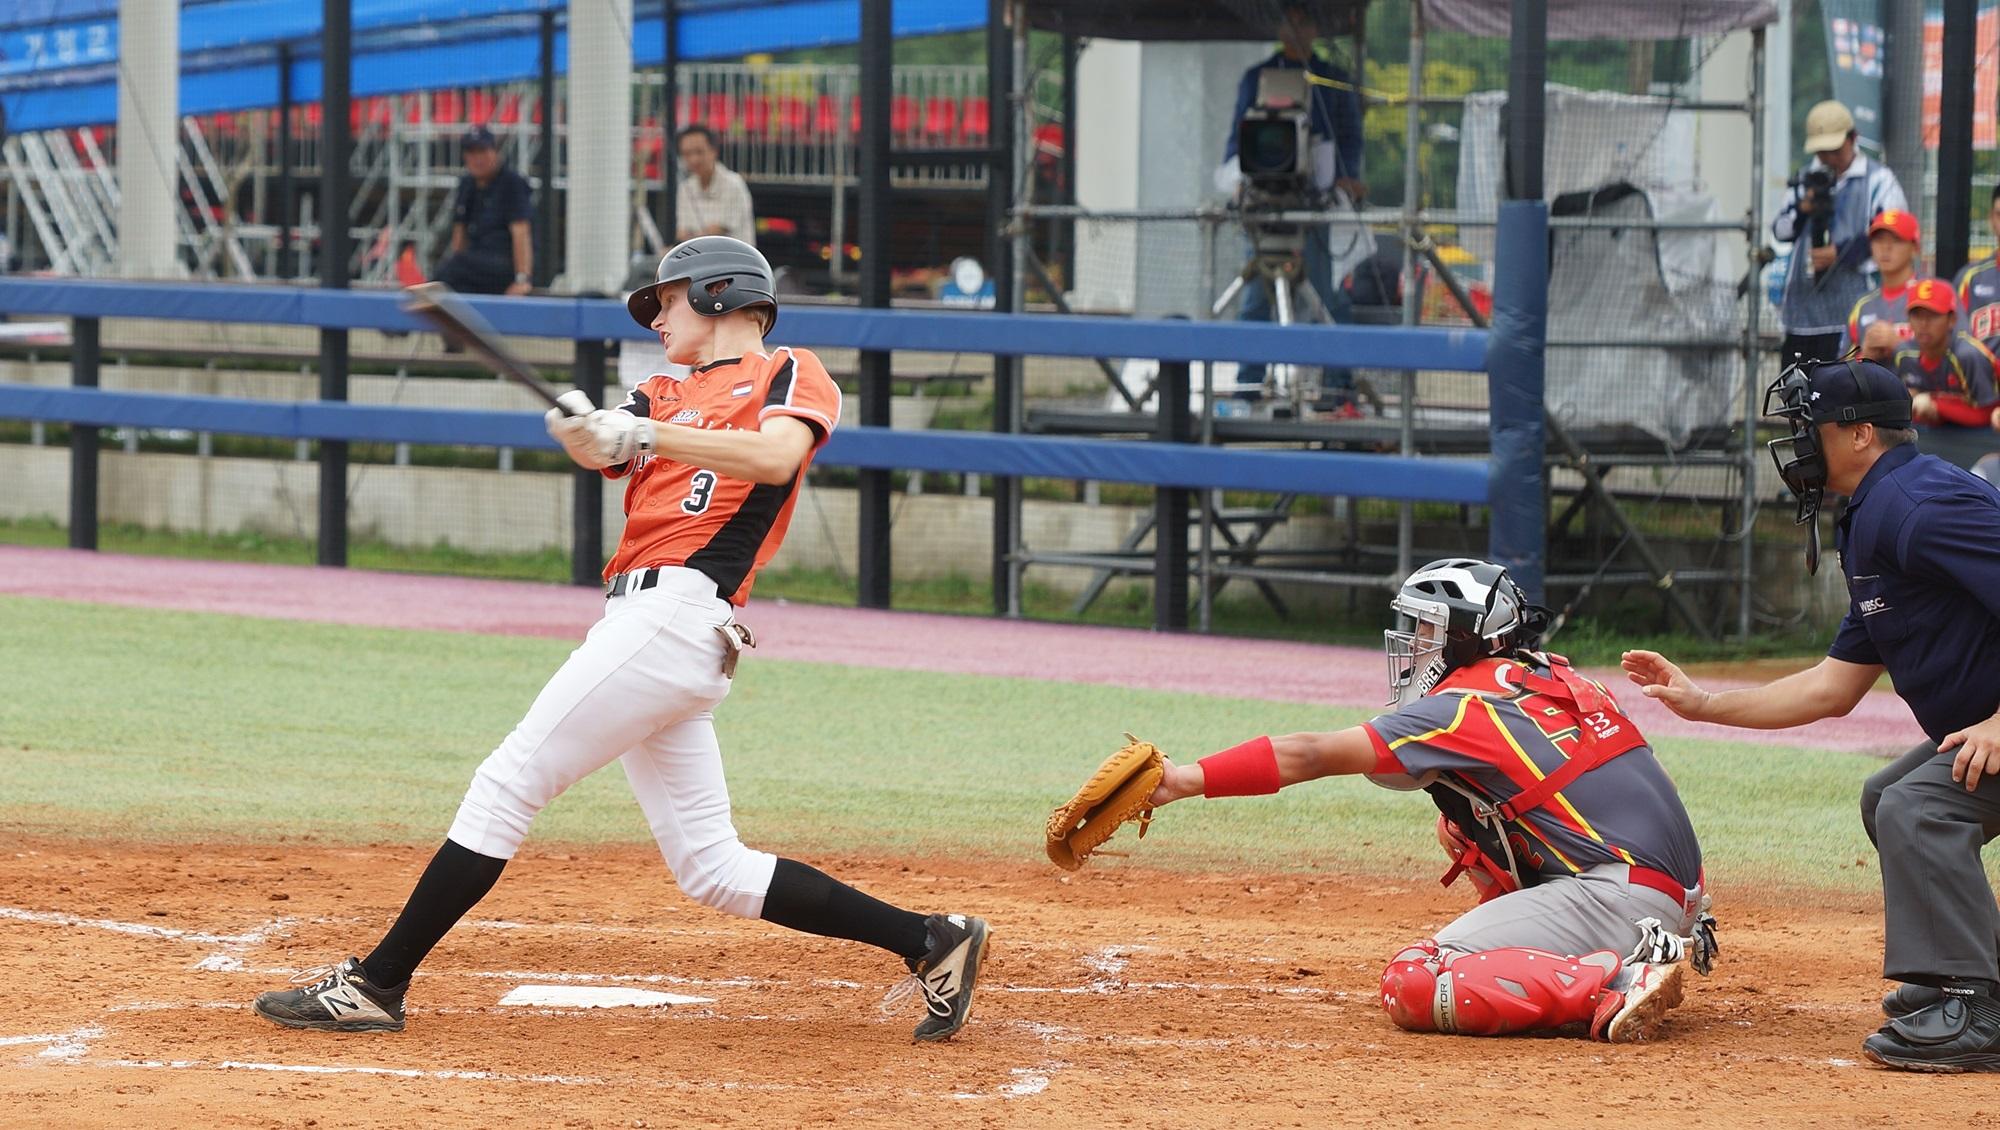 Nick Hofer swings the bat